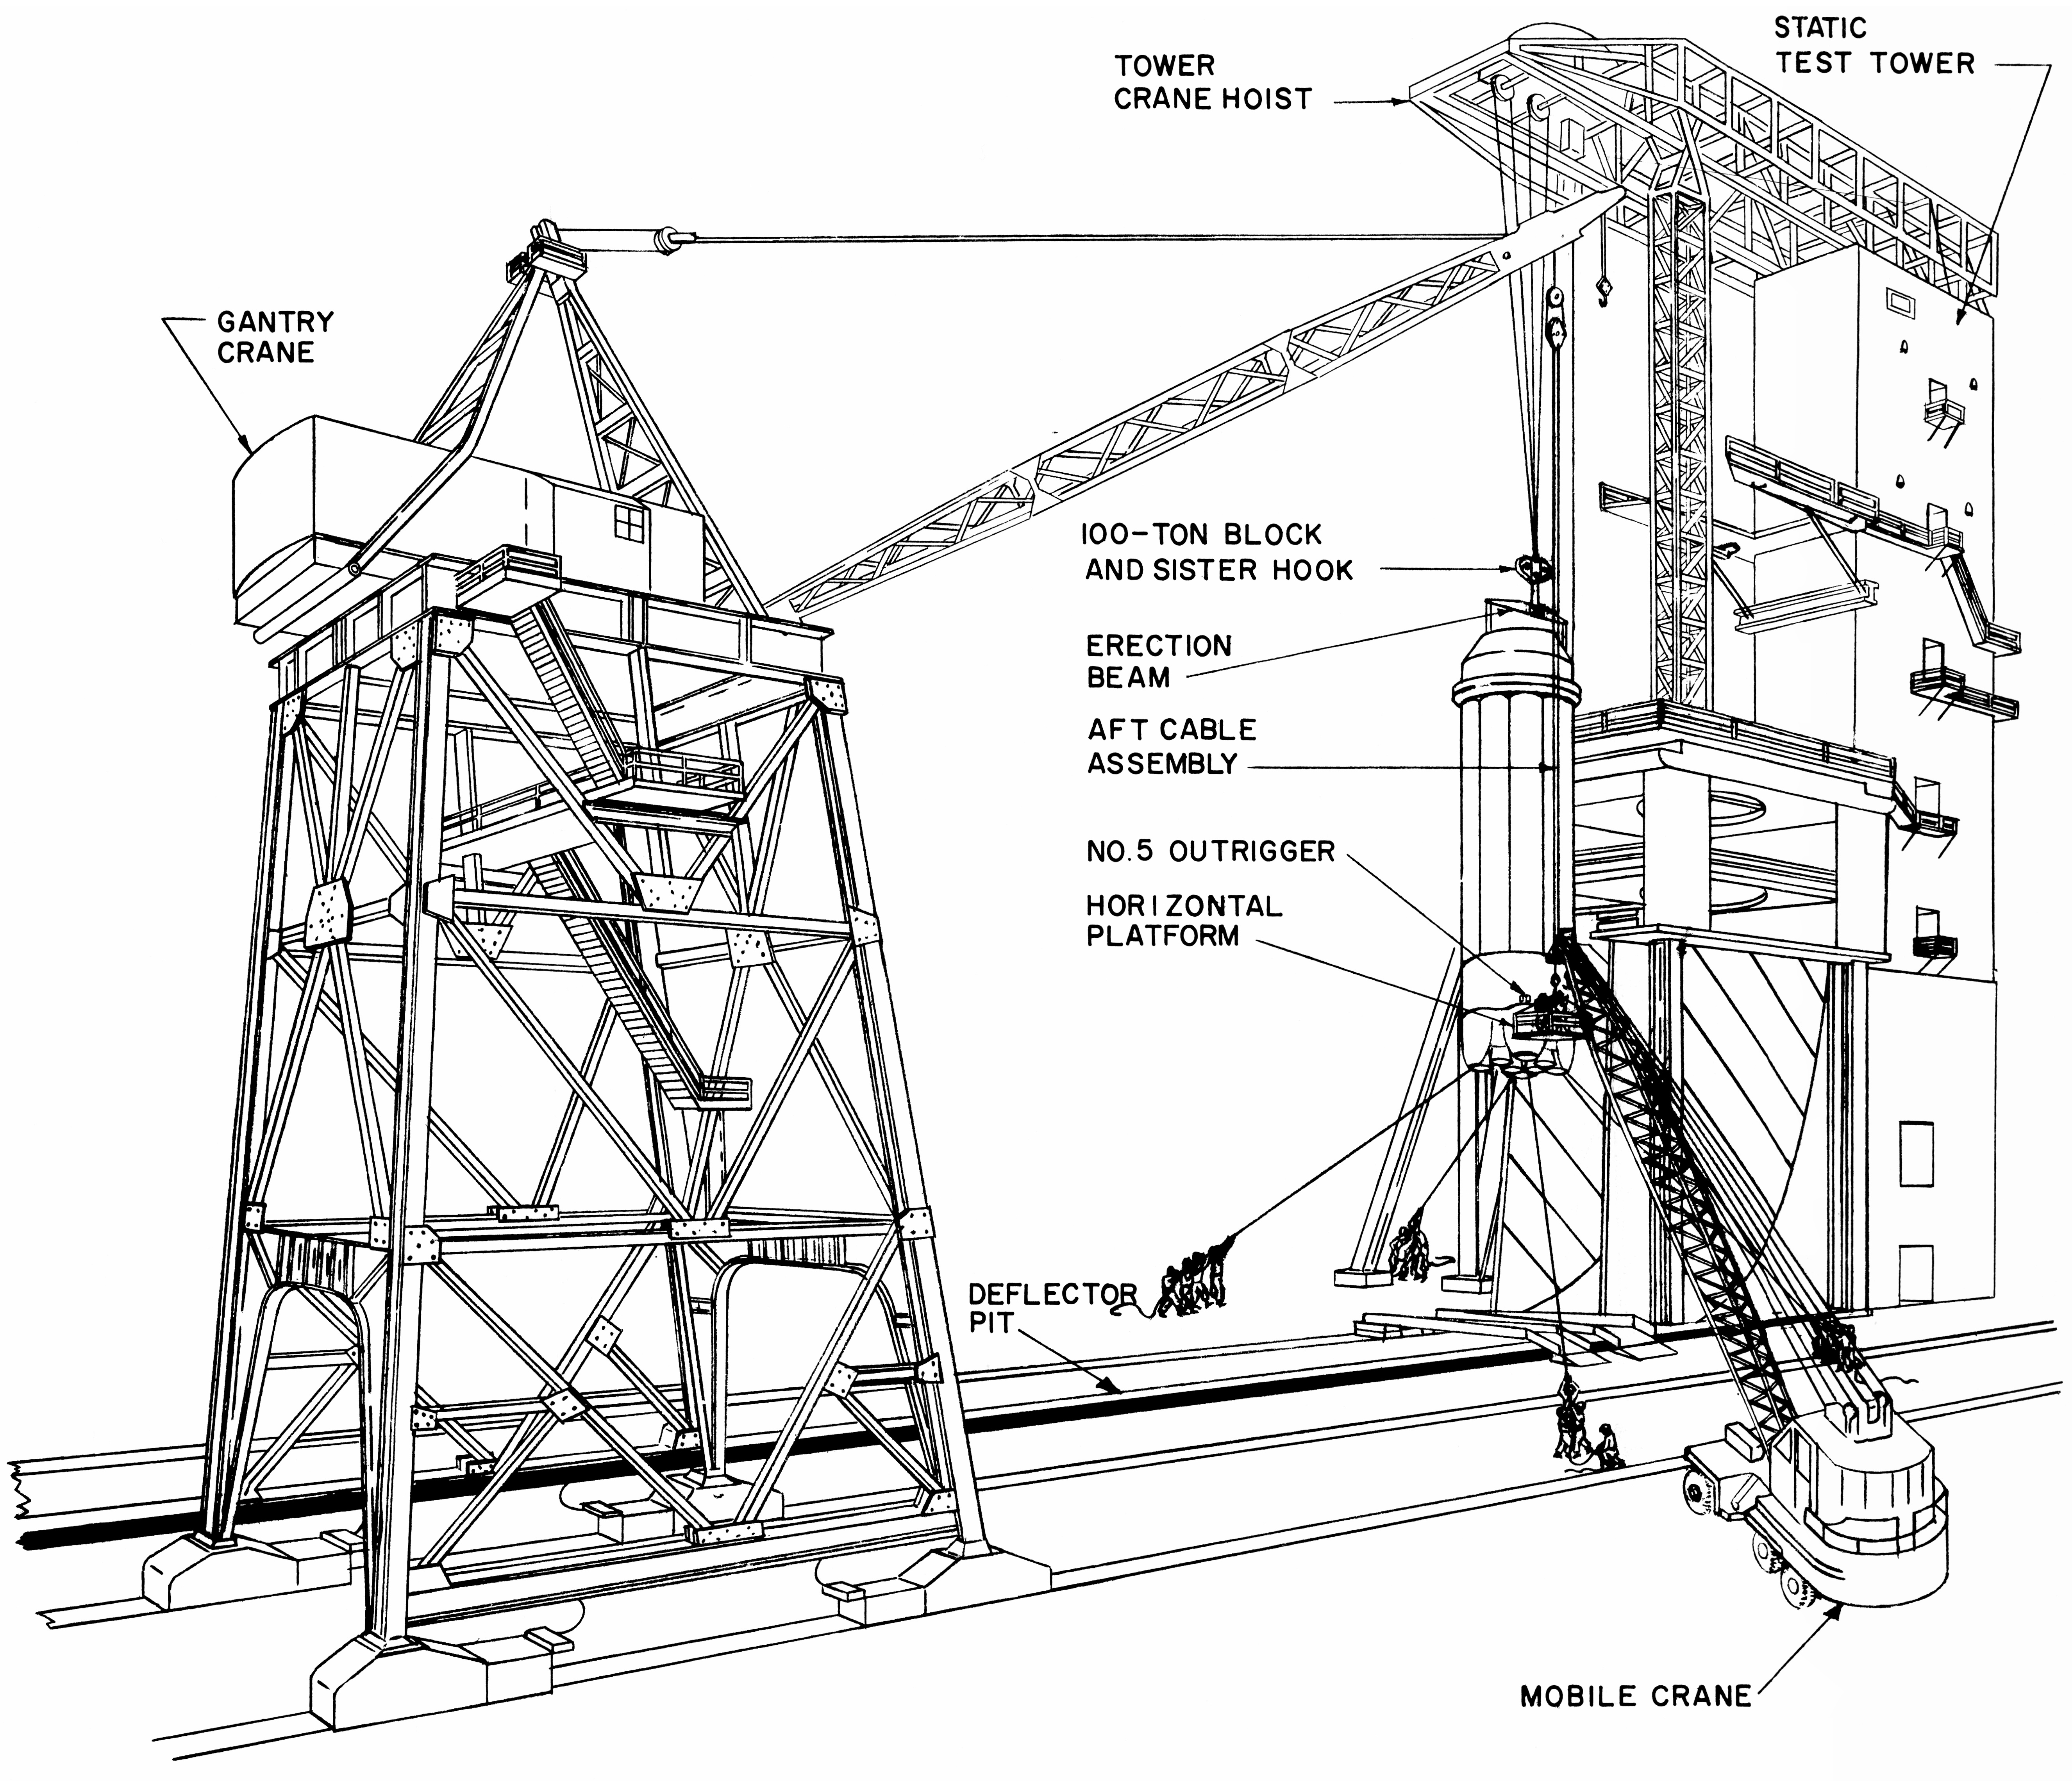 Jib Crane Parts Drawing : Msfc static test stand gantry crane